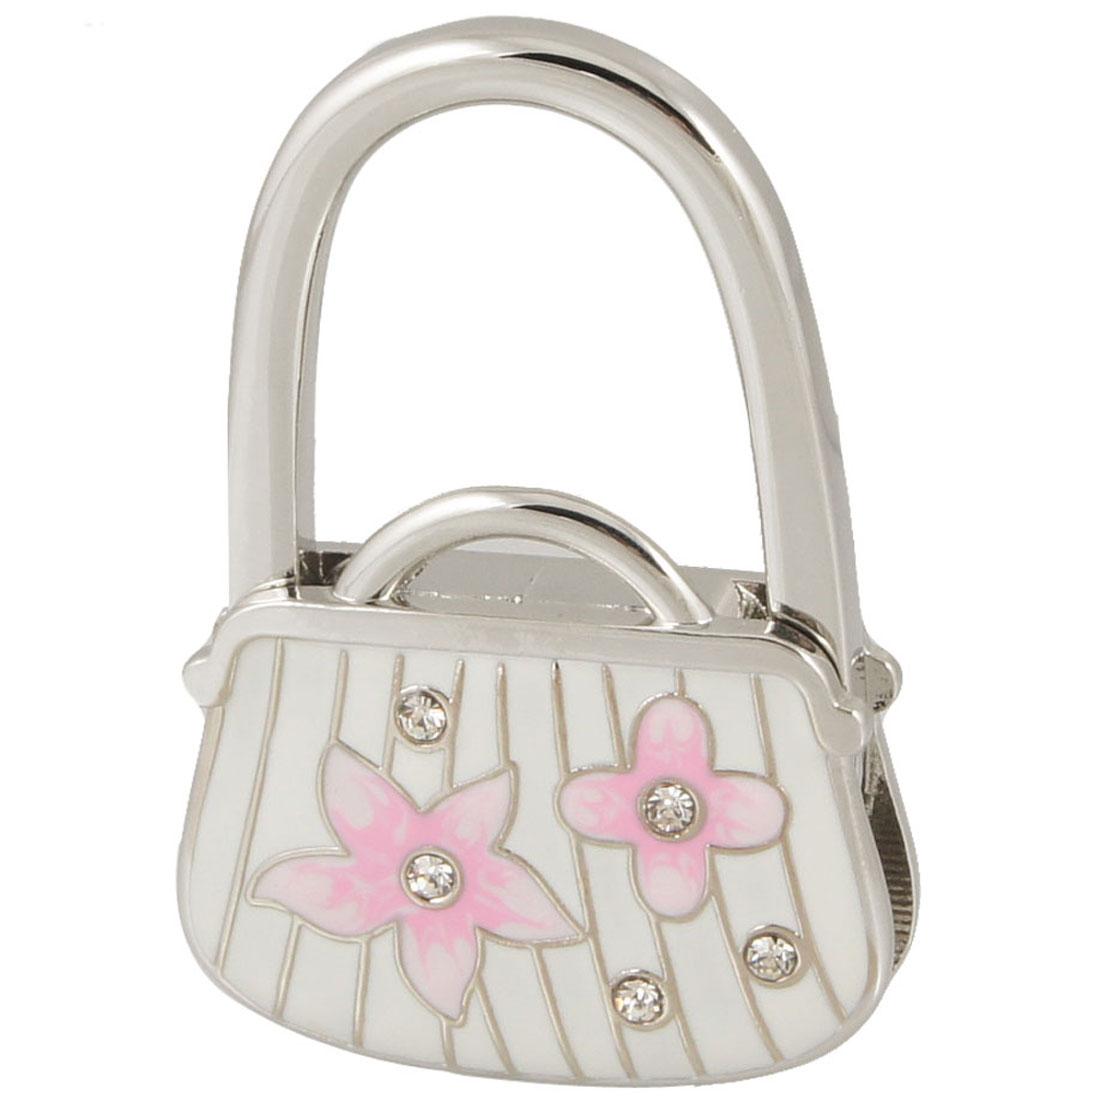 Pink Flower Prints White Silver Tone Bag Shape Folding Handbag Hook